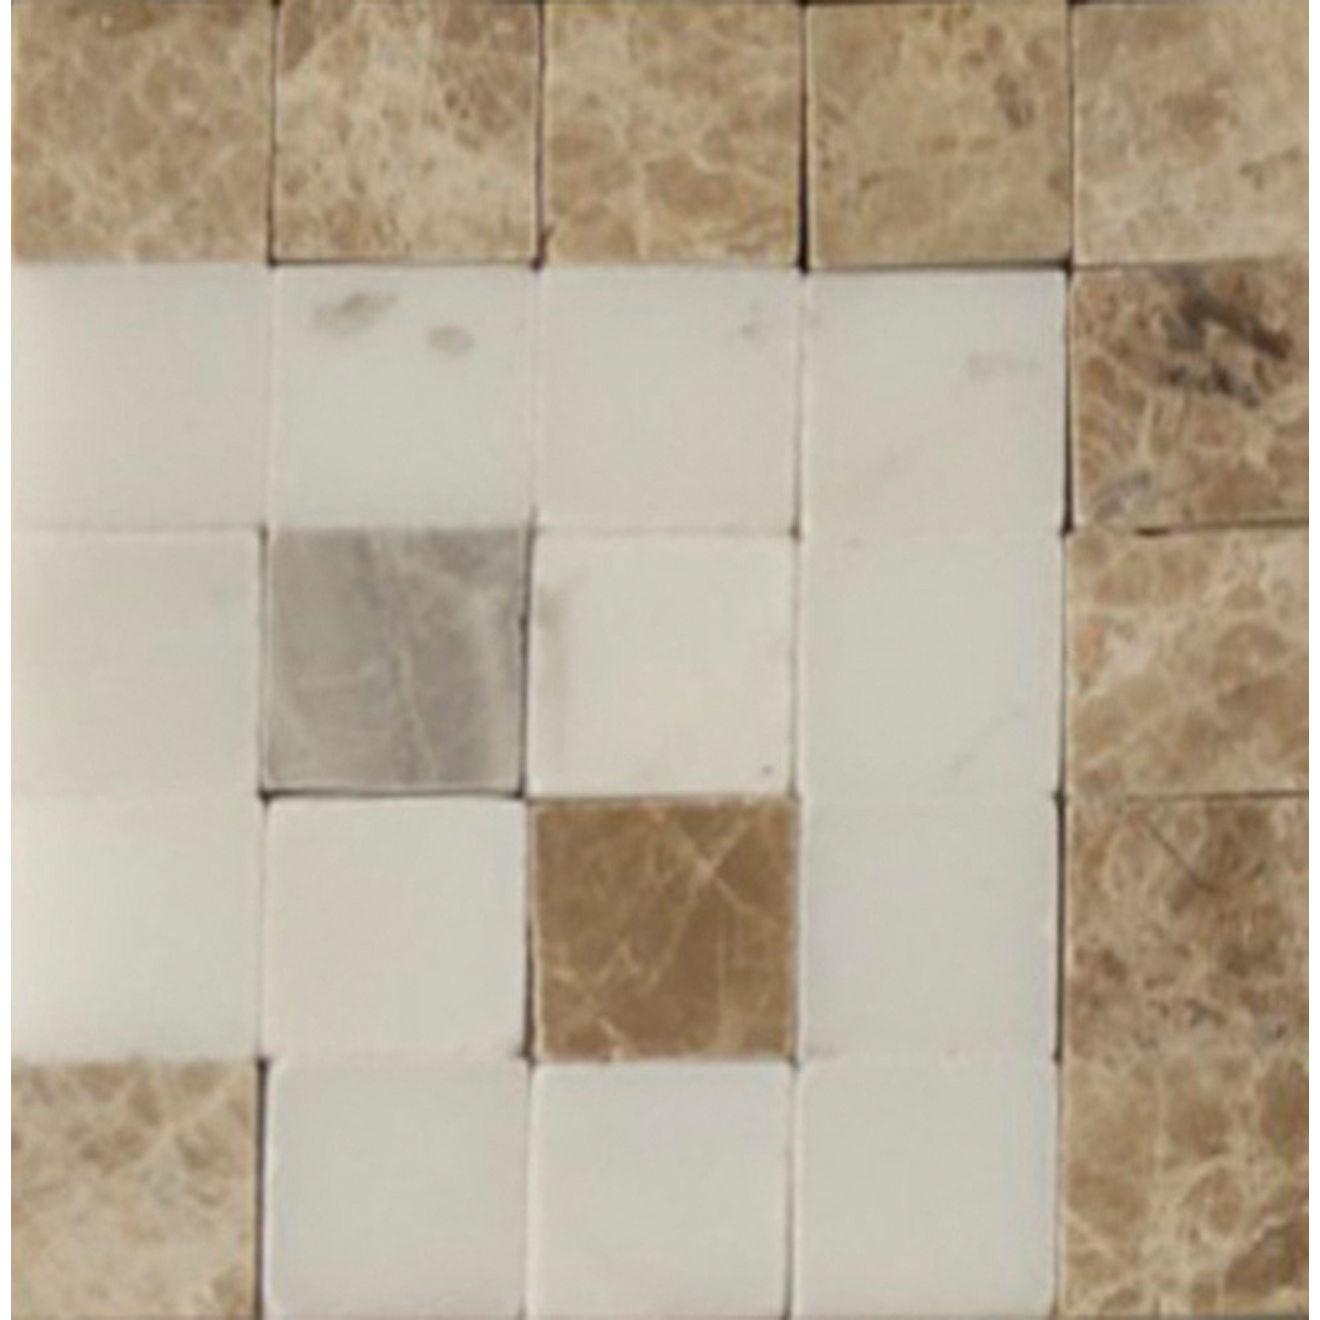 "Mod Rocks 3"" x 3"" Decorative Tile in Gris, Viburnum, White Carrera"